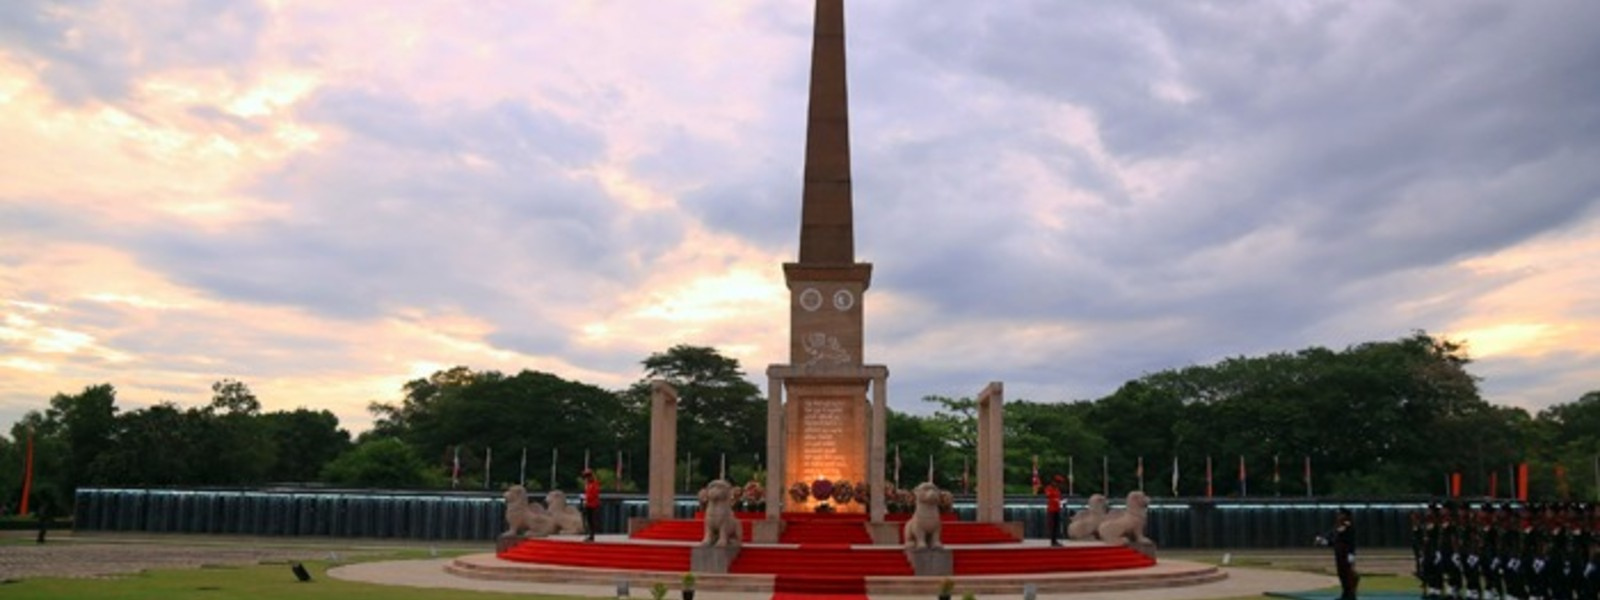 Memories of Valiant War Heroes Venerated on National War Heroes' Day